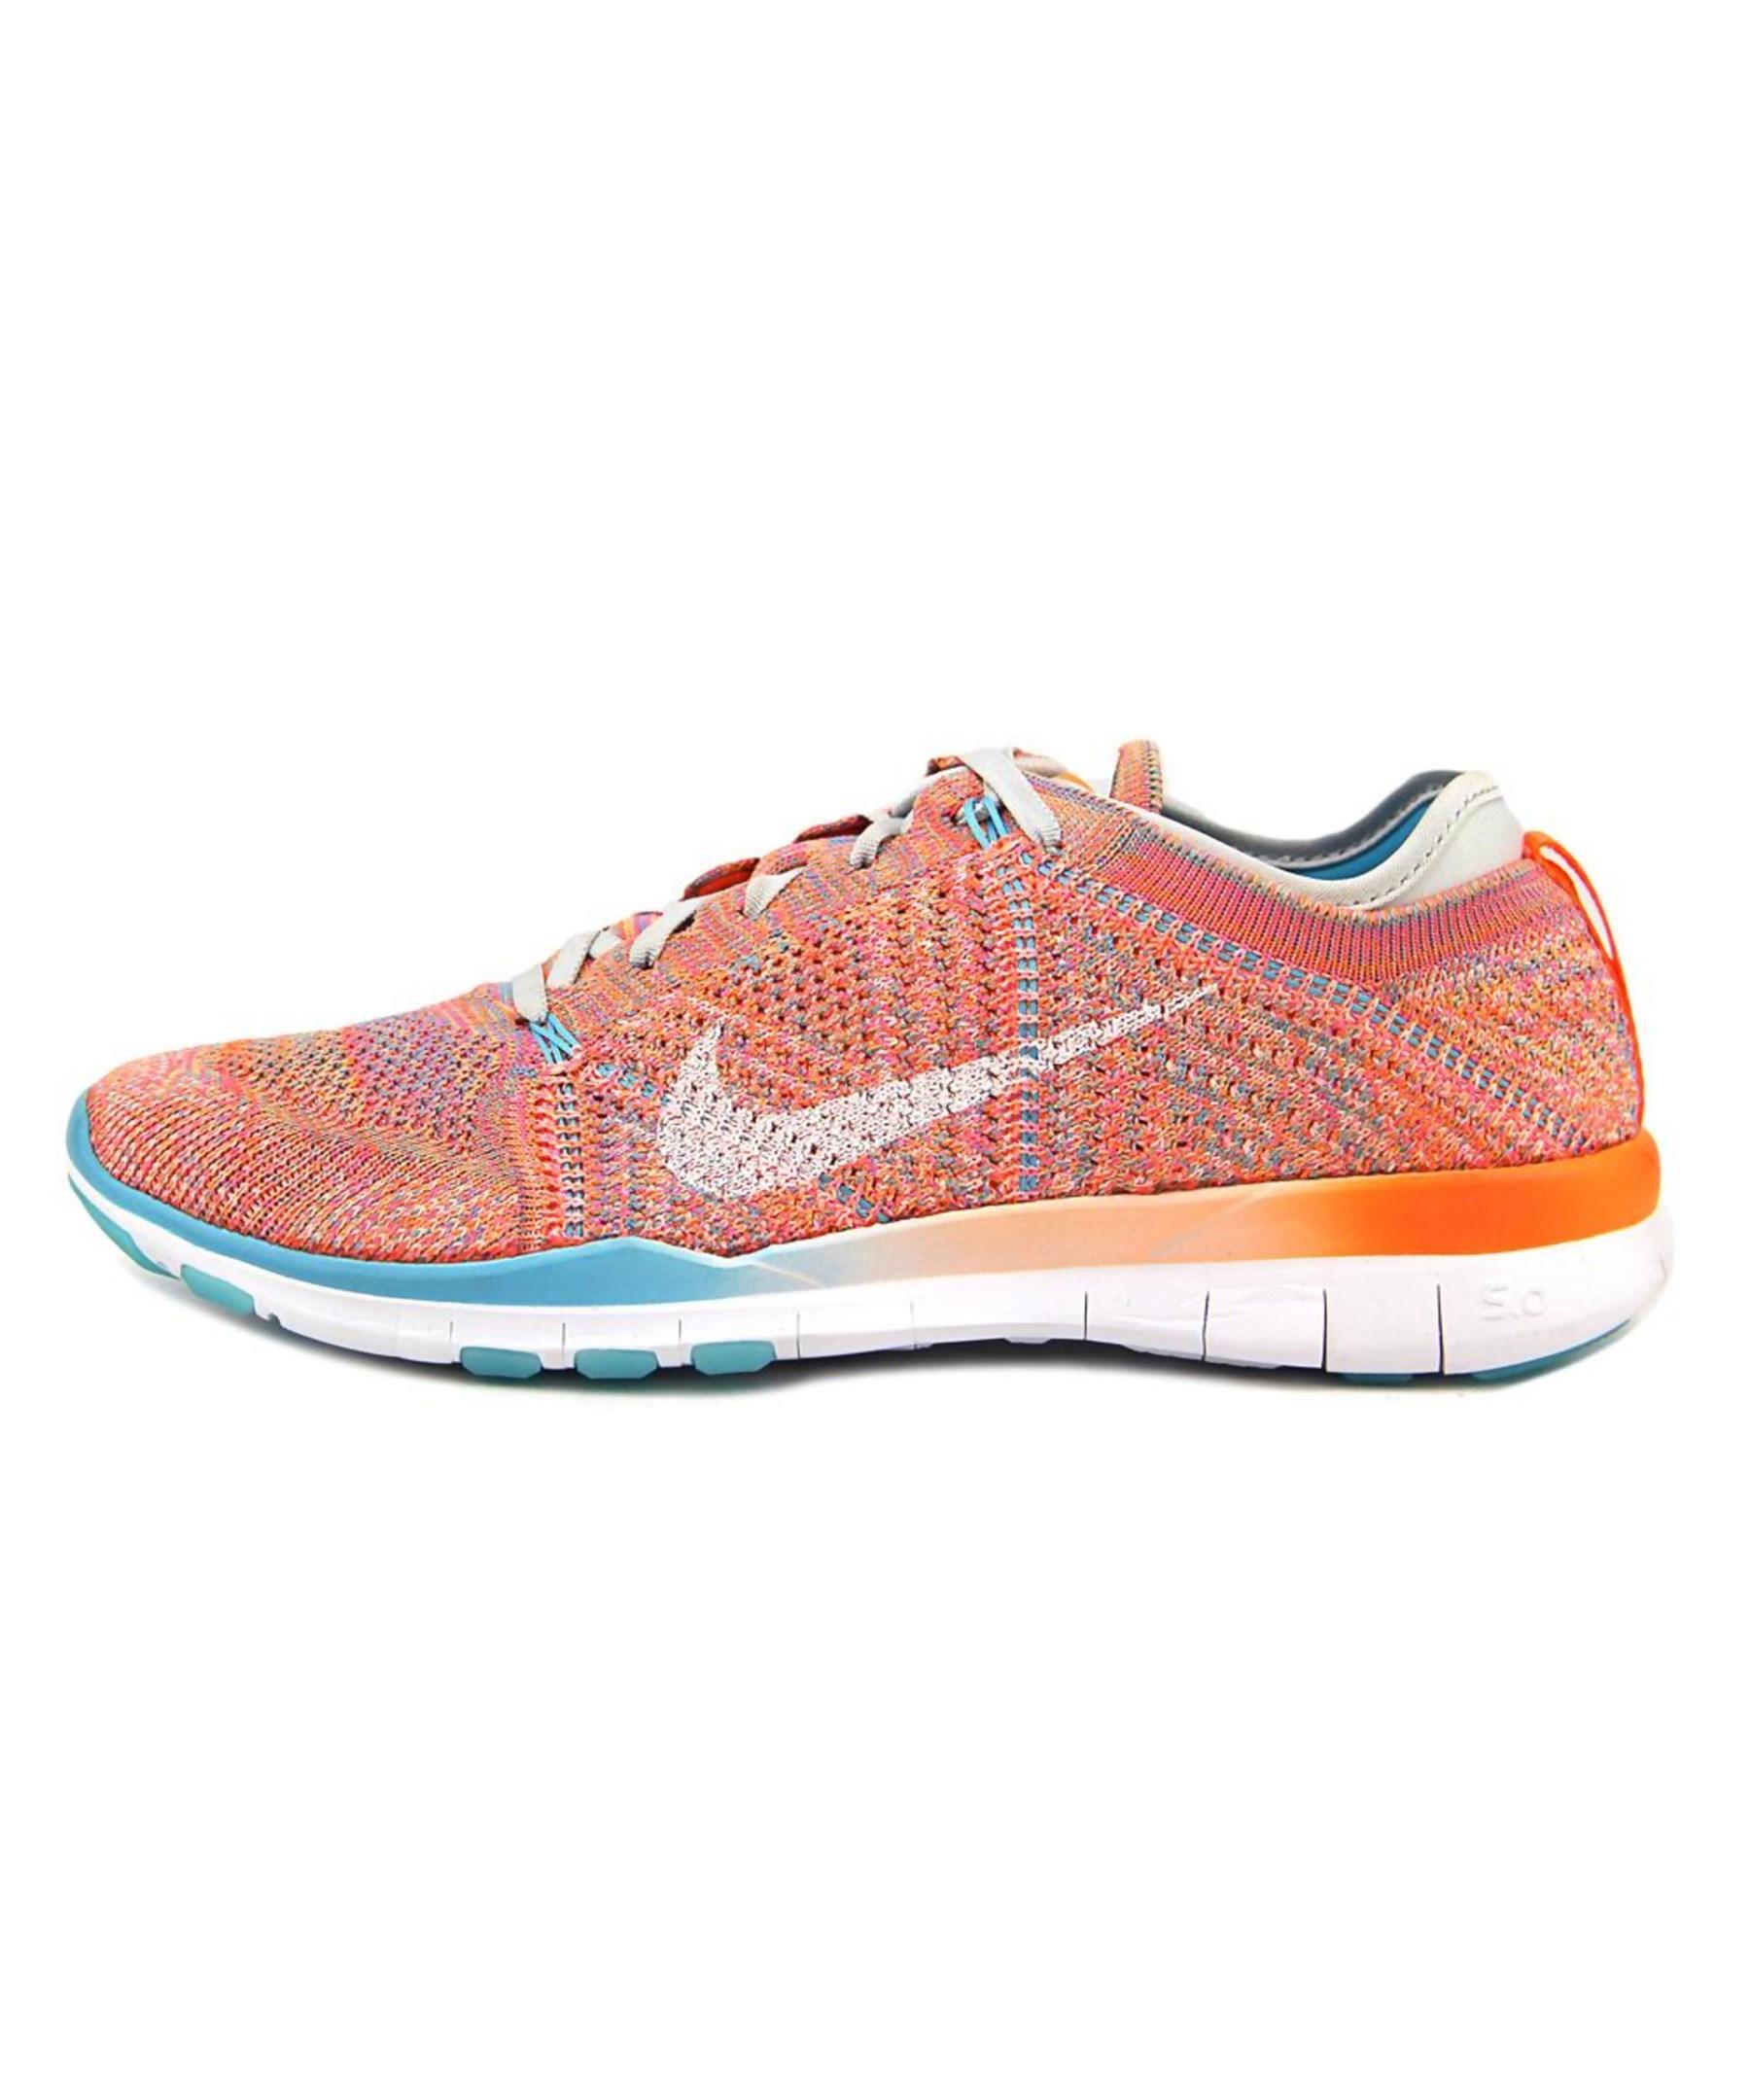 c616c6e30fbfc Lyst - Nike Free Tr Flyknit Women Round Toe Synthetic Running Shoe ...